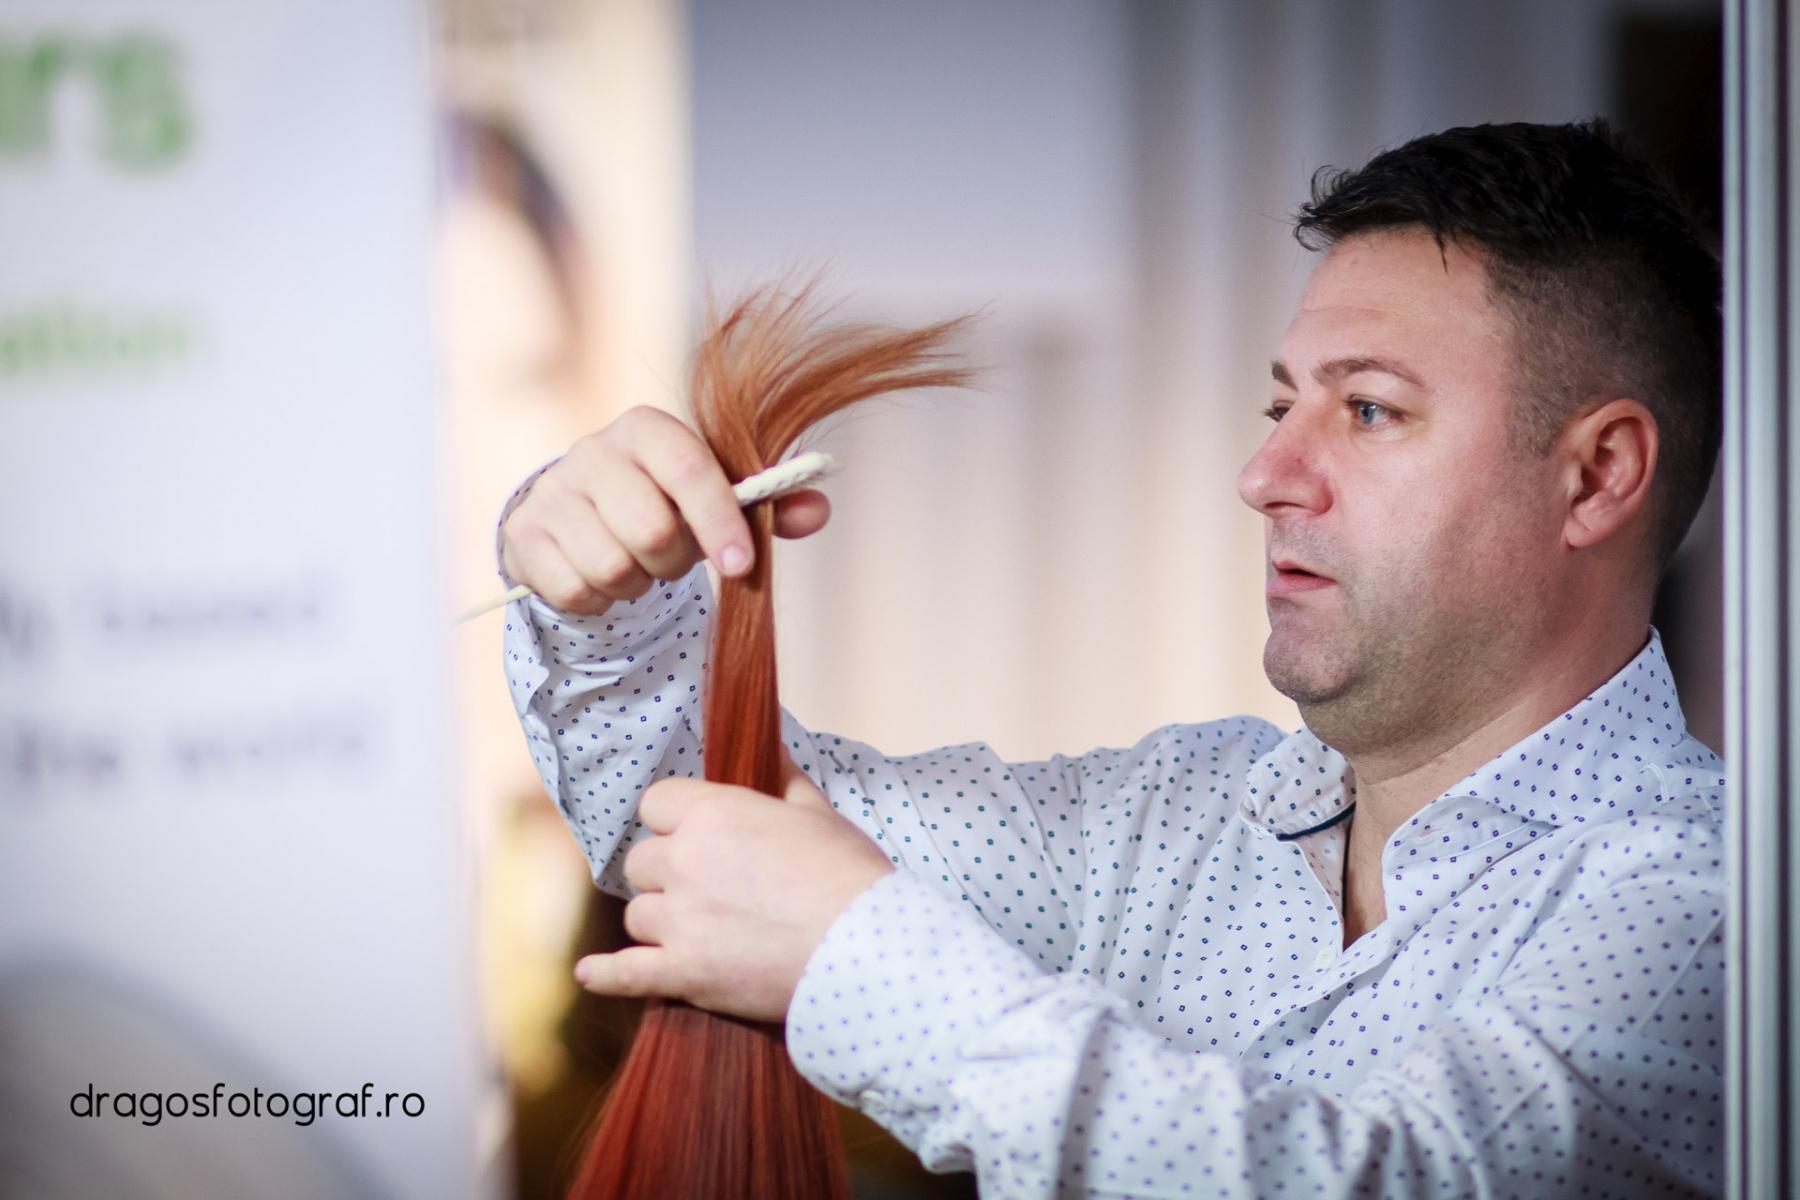 dragos-fotograf-prezentare-natulique009